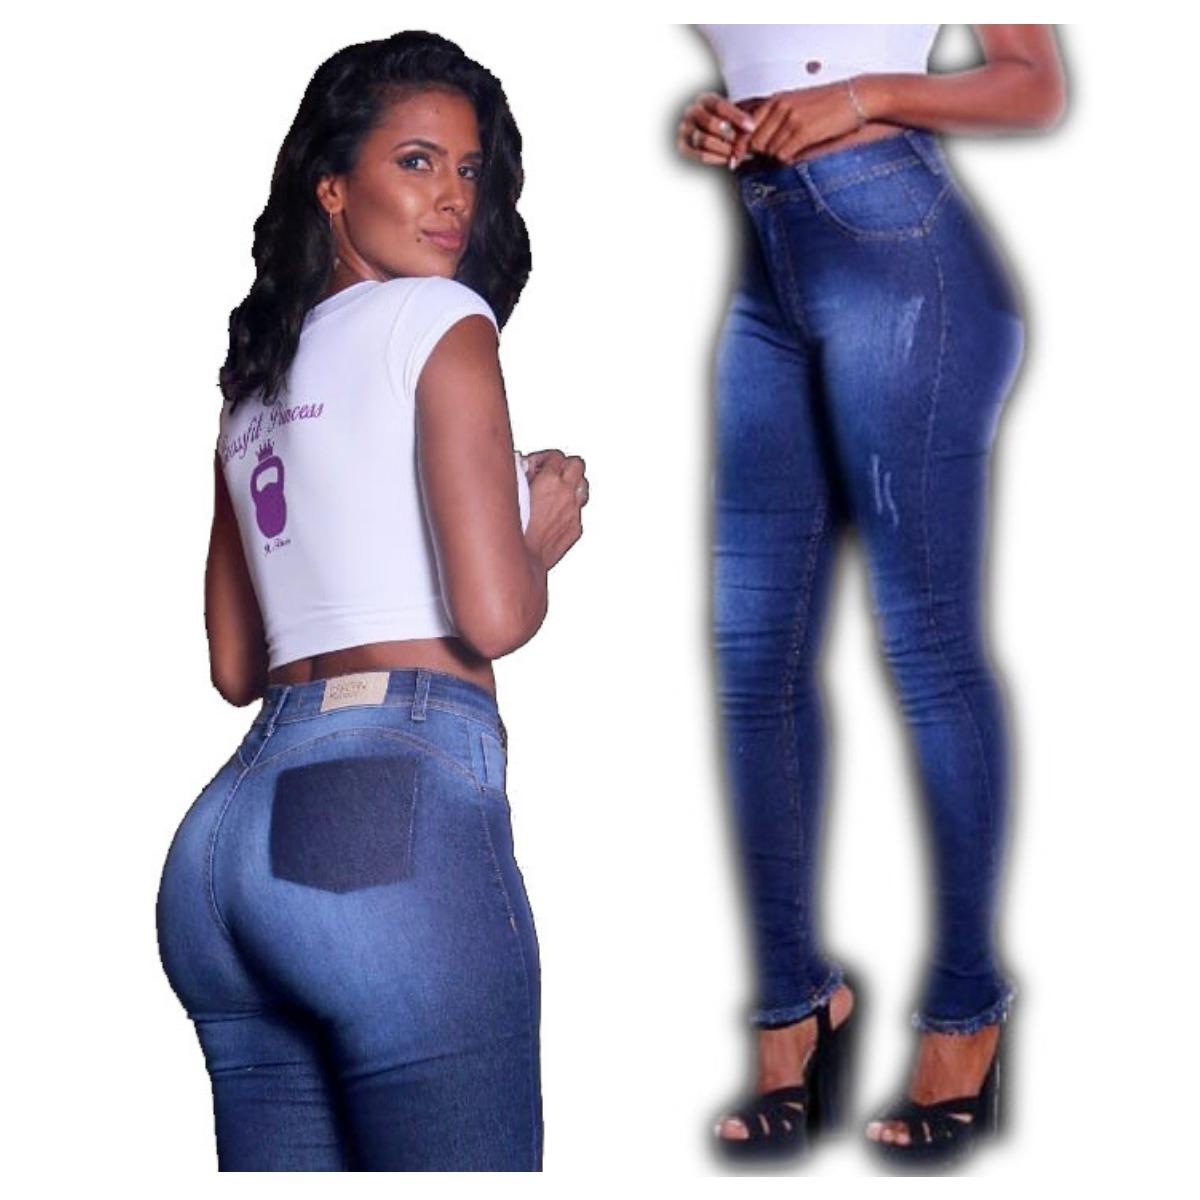 81f5c0bb5 calca jeans feminina skinny detonada cintura alta panicat. Carregando zoom.